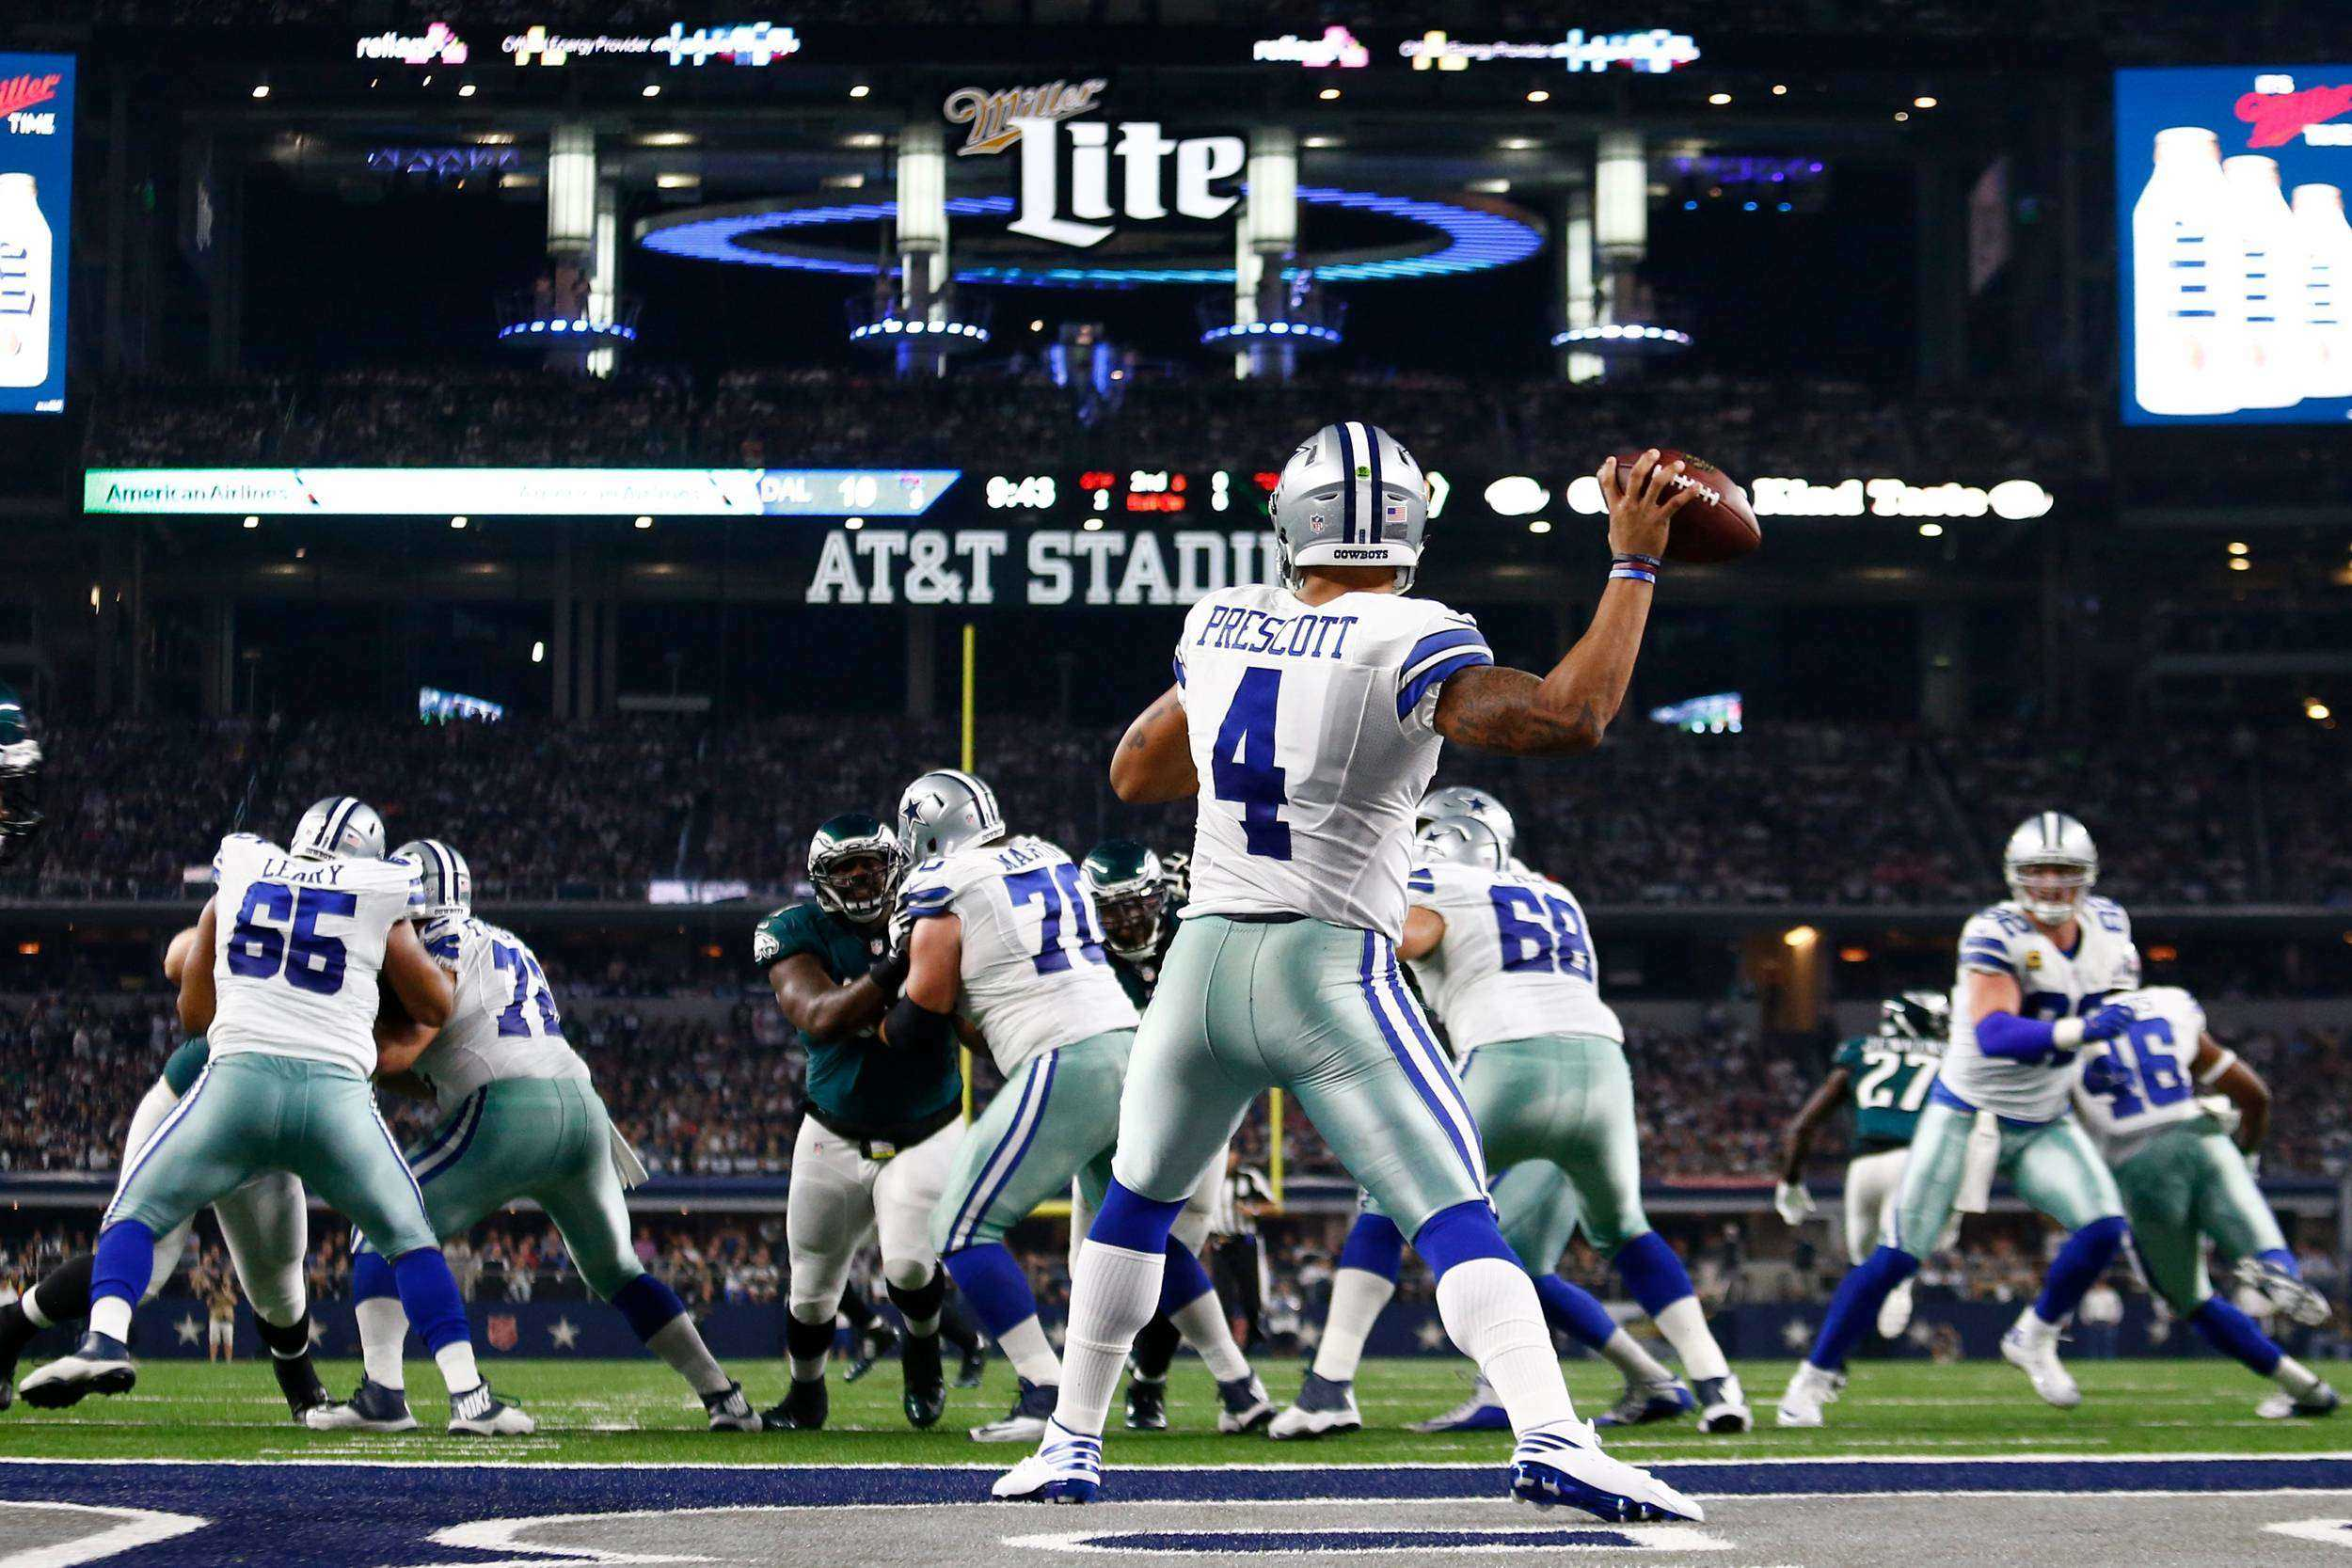 dd9434a205b63 Dallas Cowboys Player Profile - QB  4 Dak Prescott